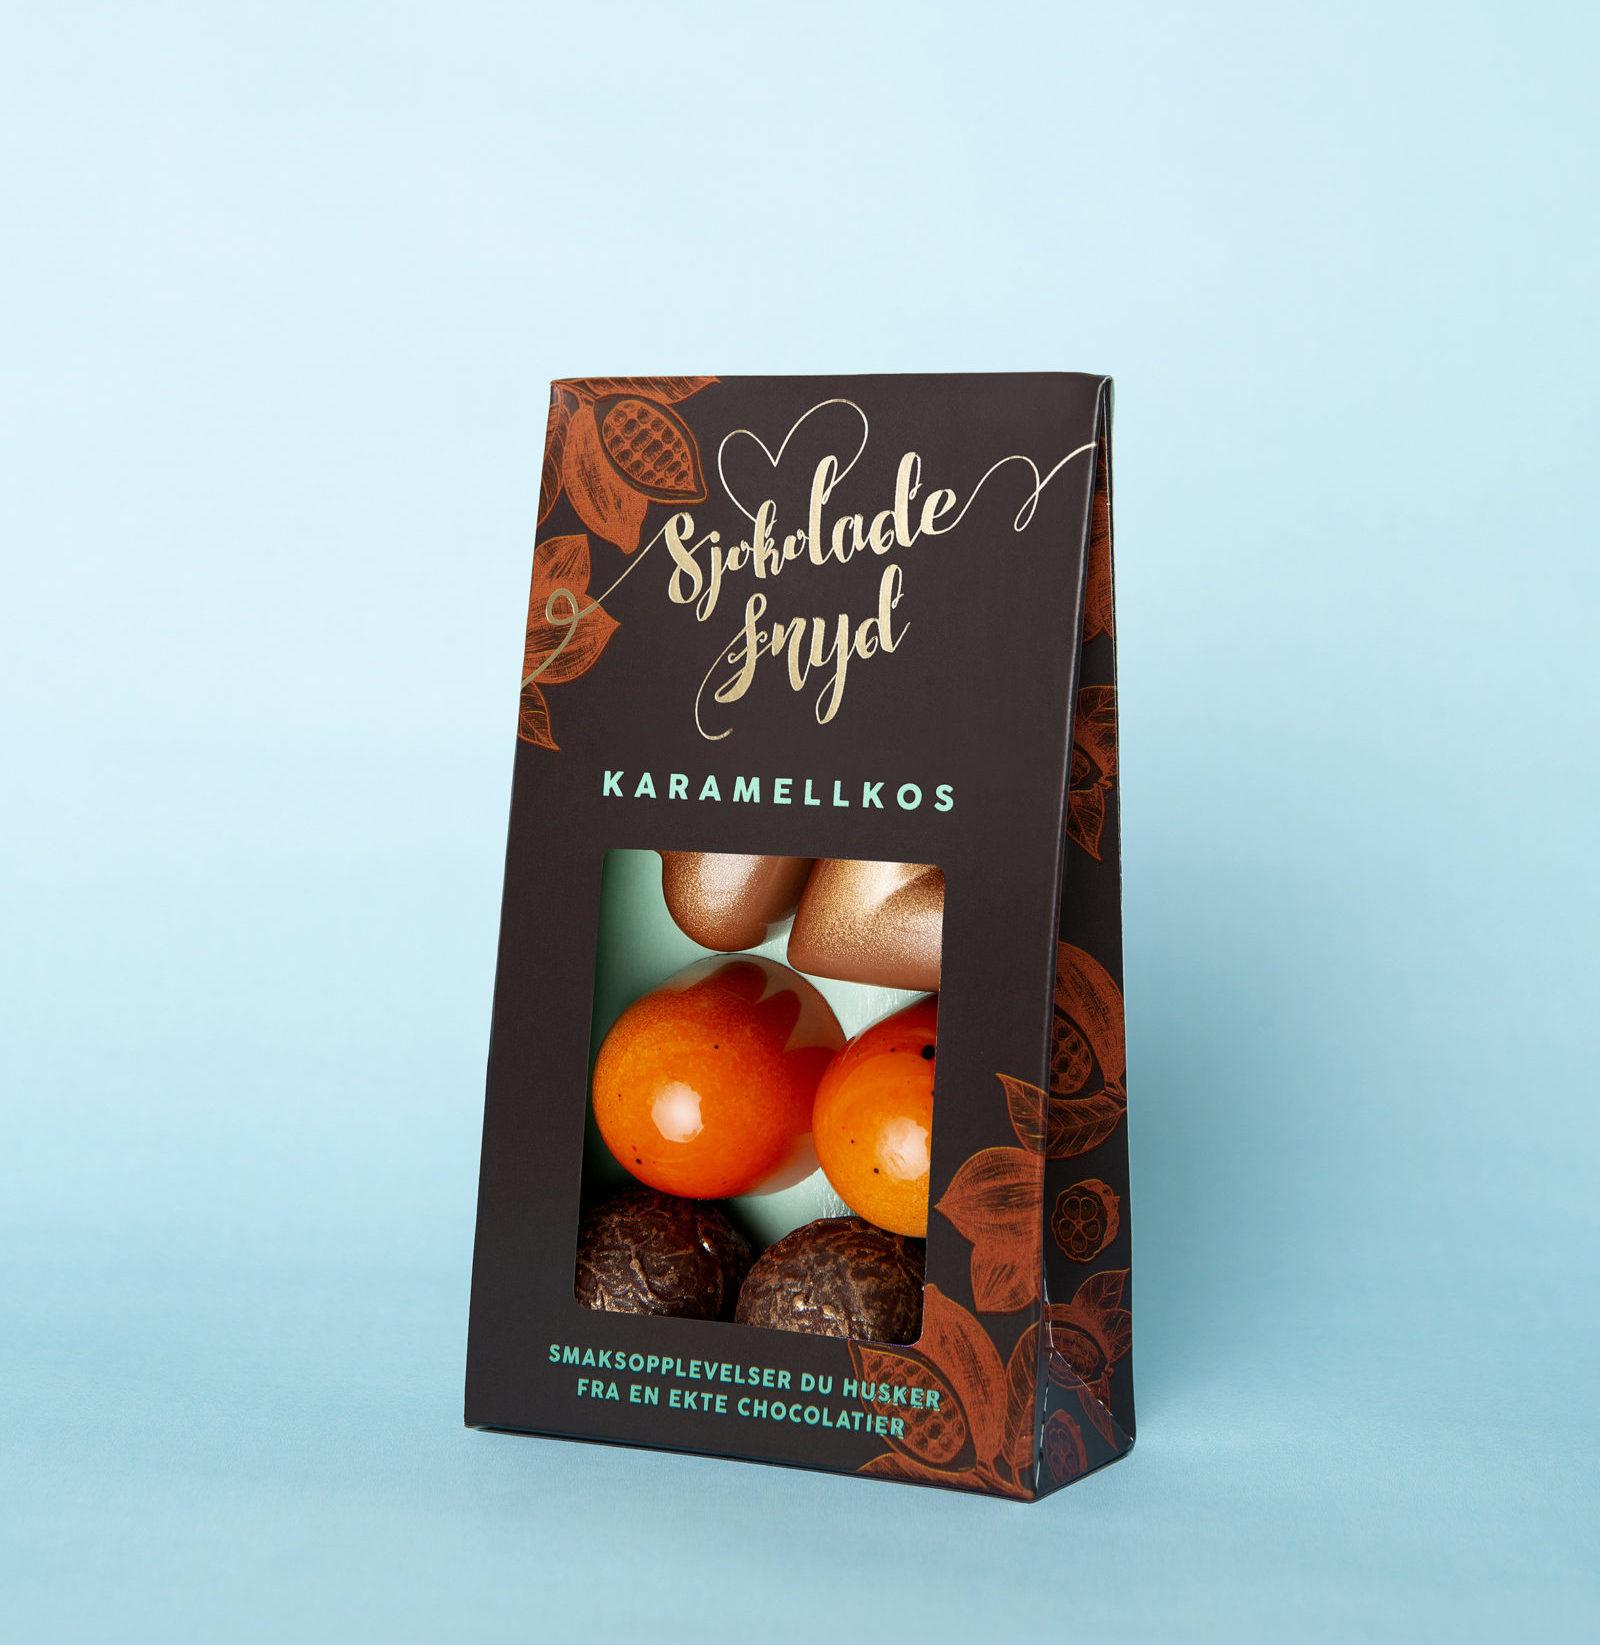 Karamellkos 6 biter Pose Sjokoladefryd